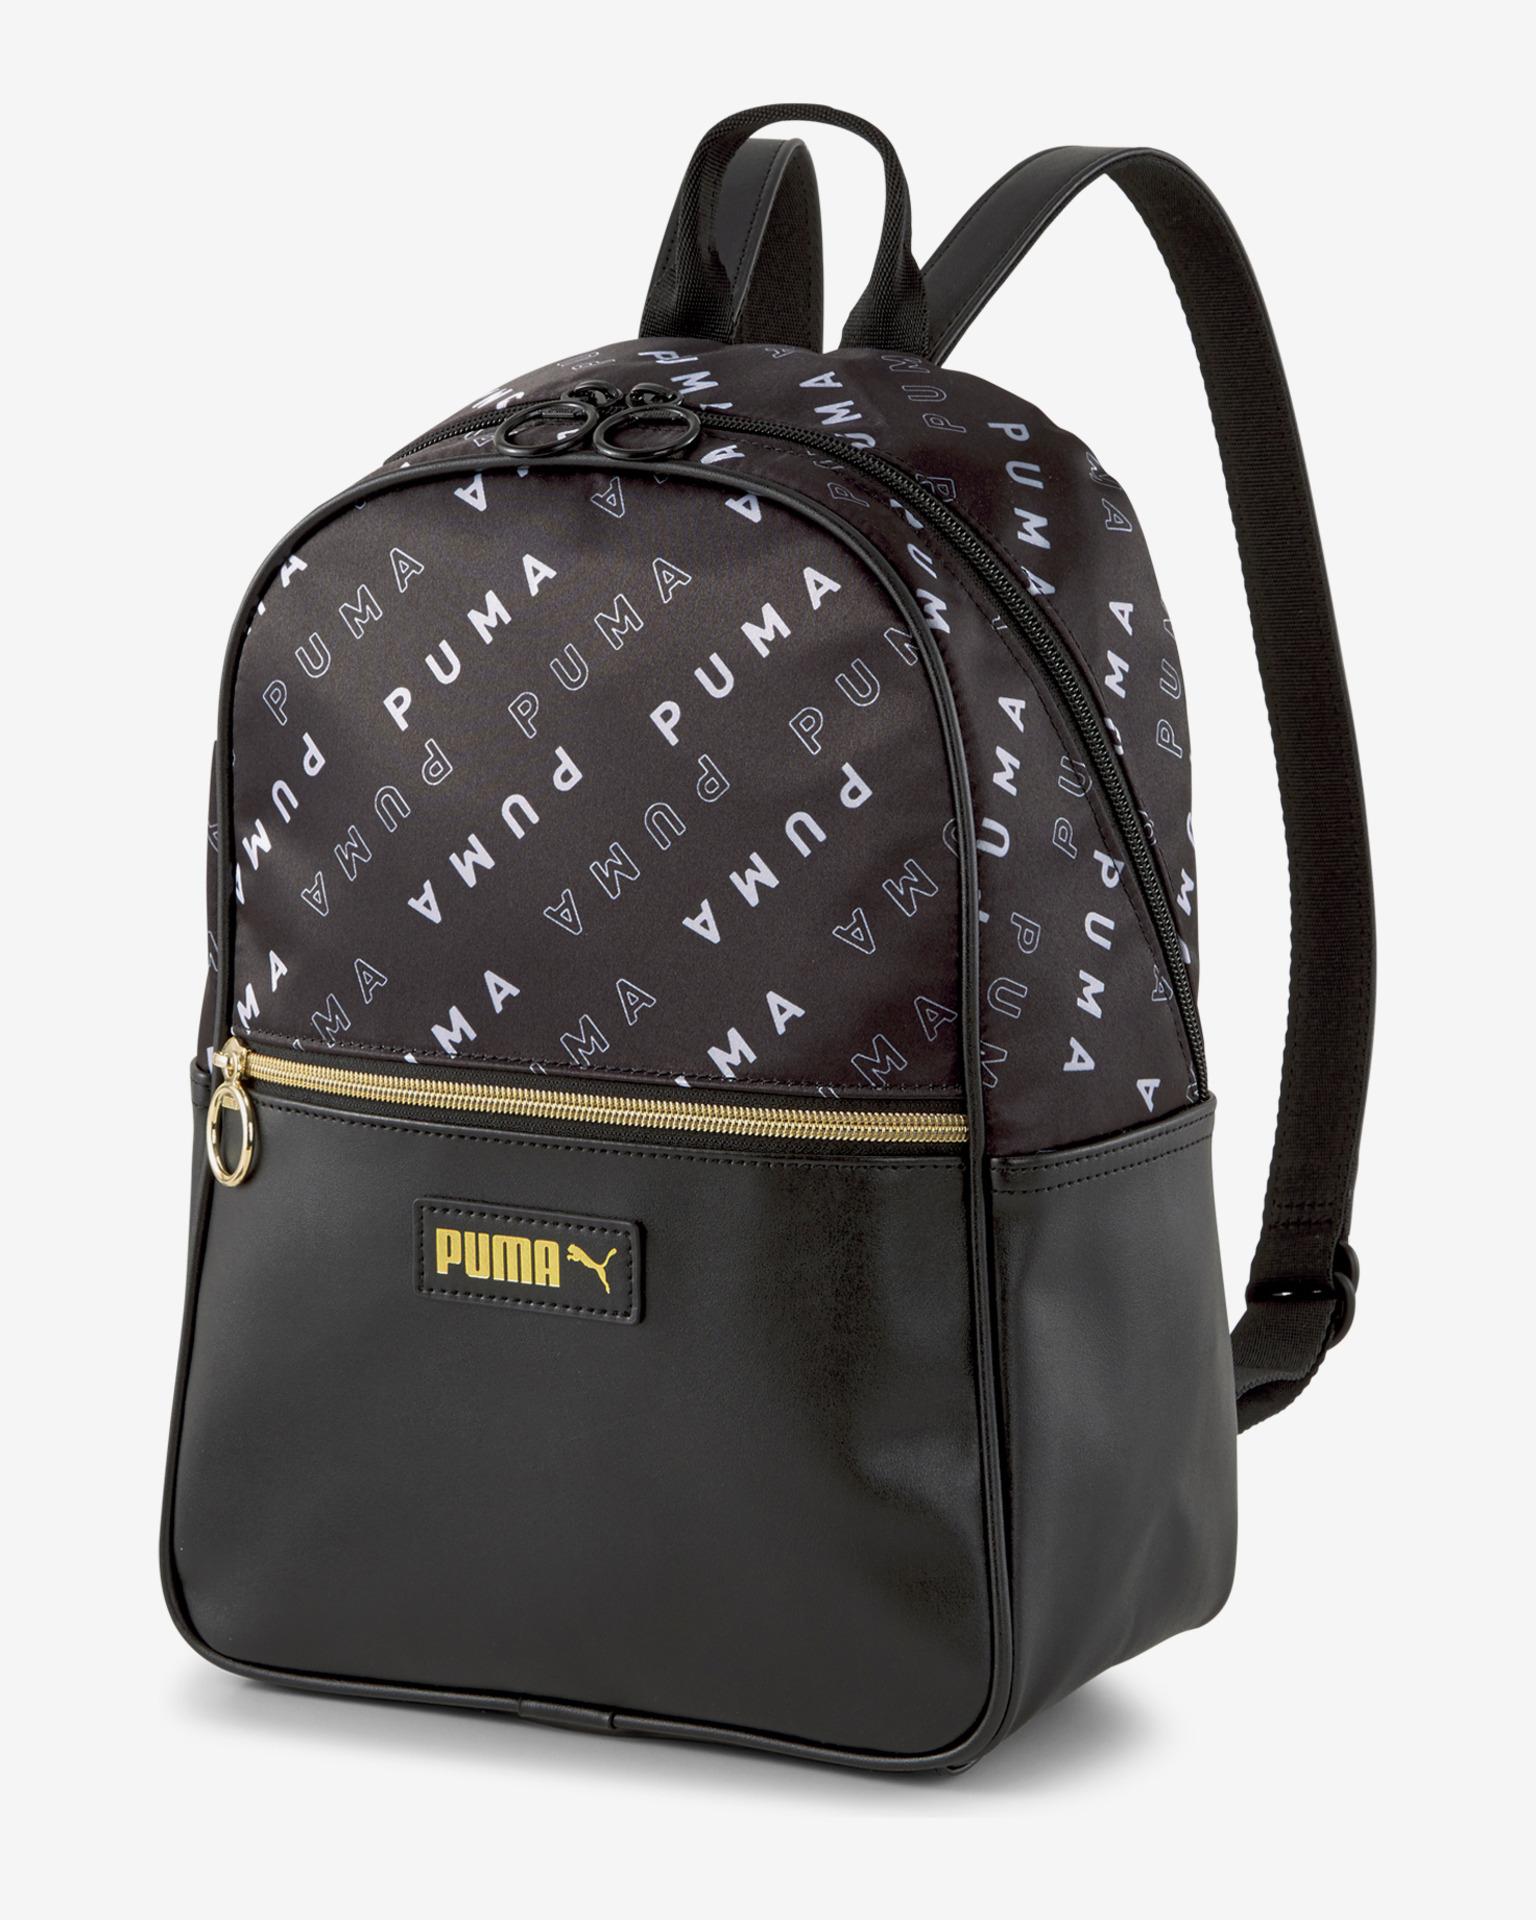 Puma Prime Classics Backpack Black